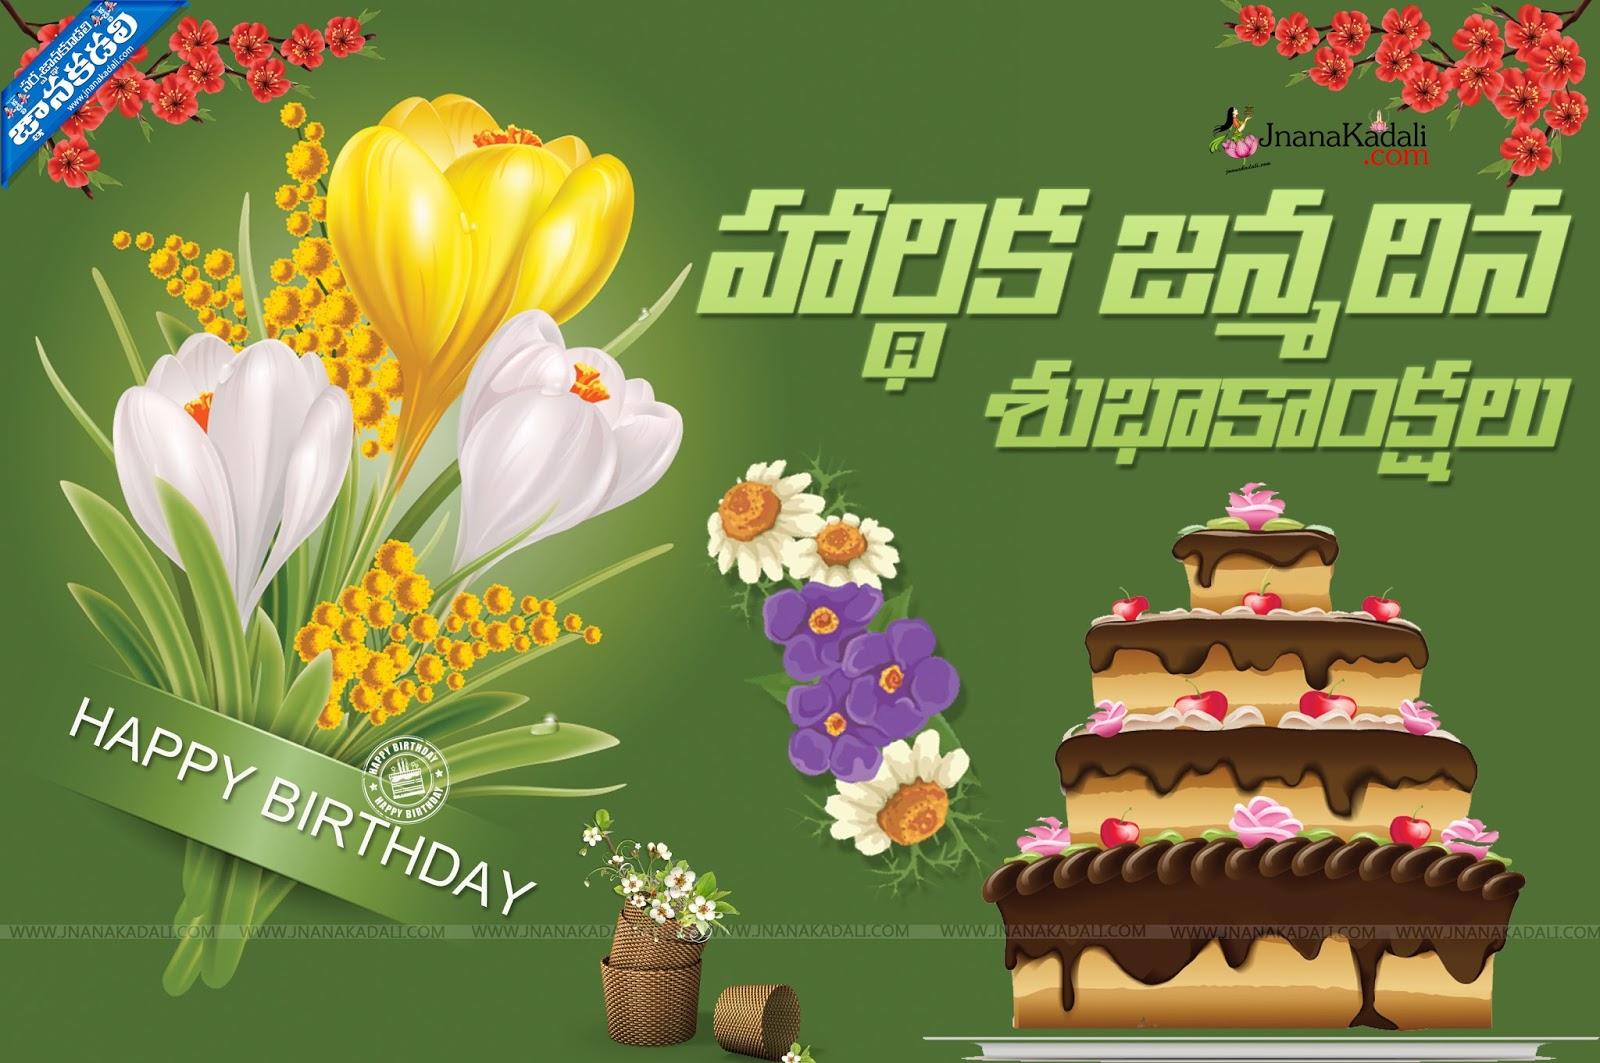 Birthday message in english language birthday wishes for husband birthday message in english language telugu best birthday quotes and wishes greetings cards kristyandbryce Gallery